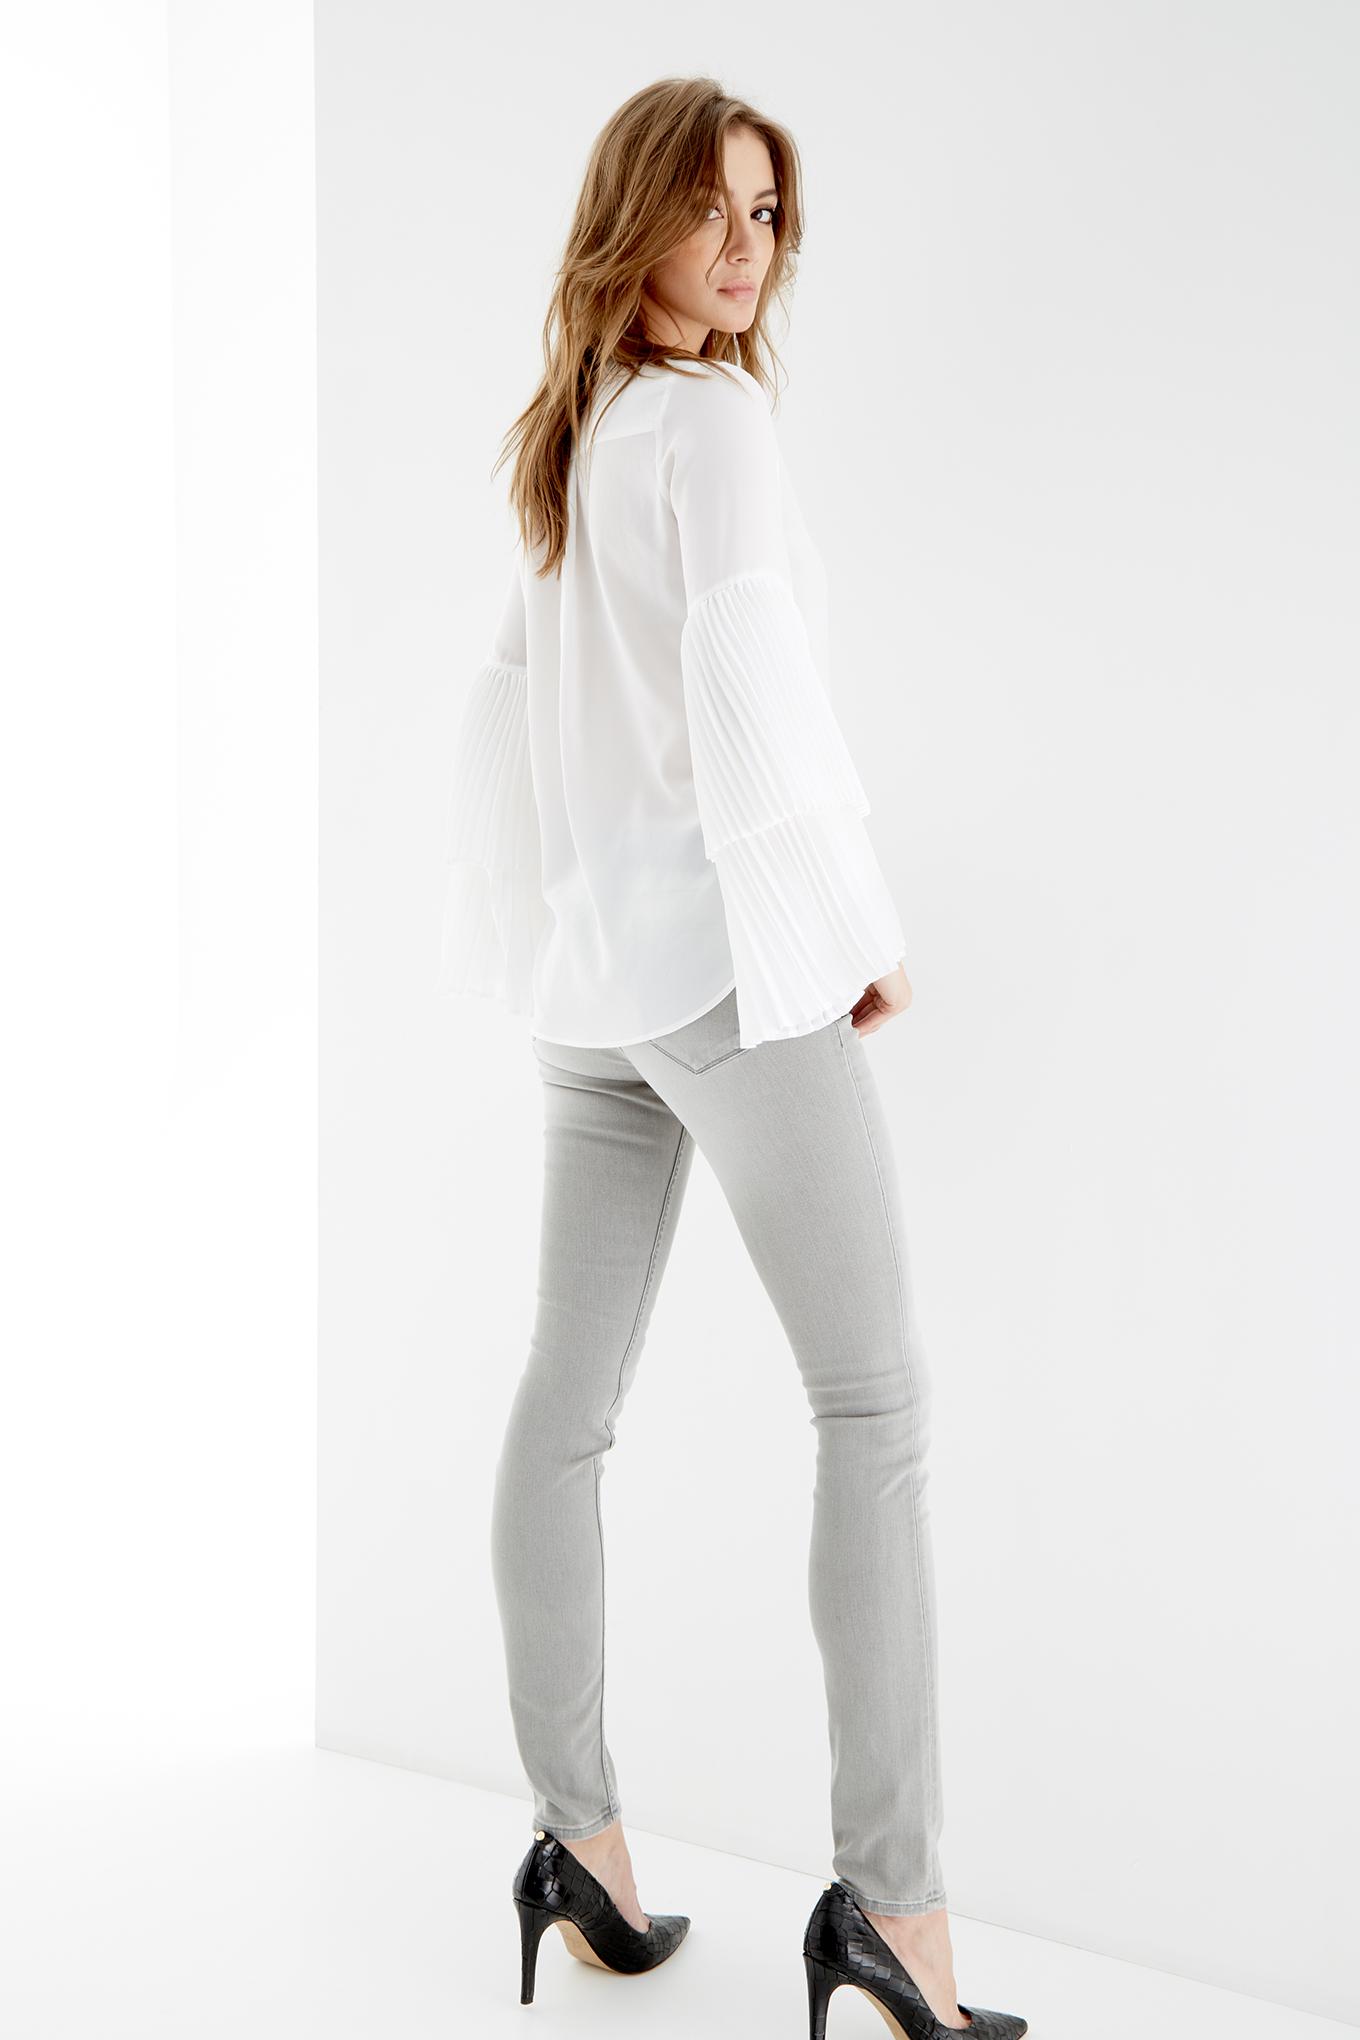 Jeans Light Grey Sport Woman